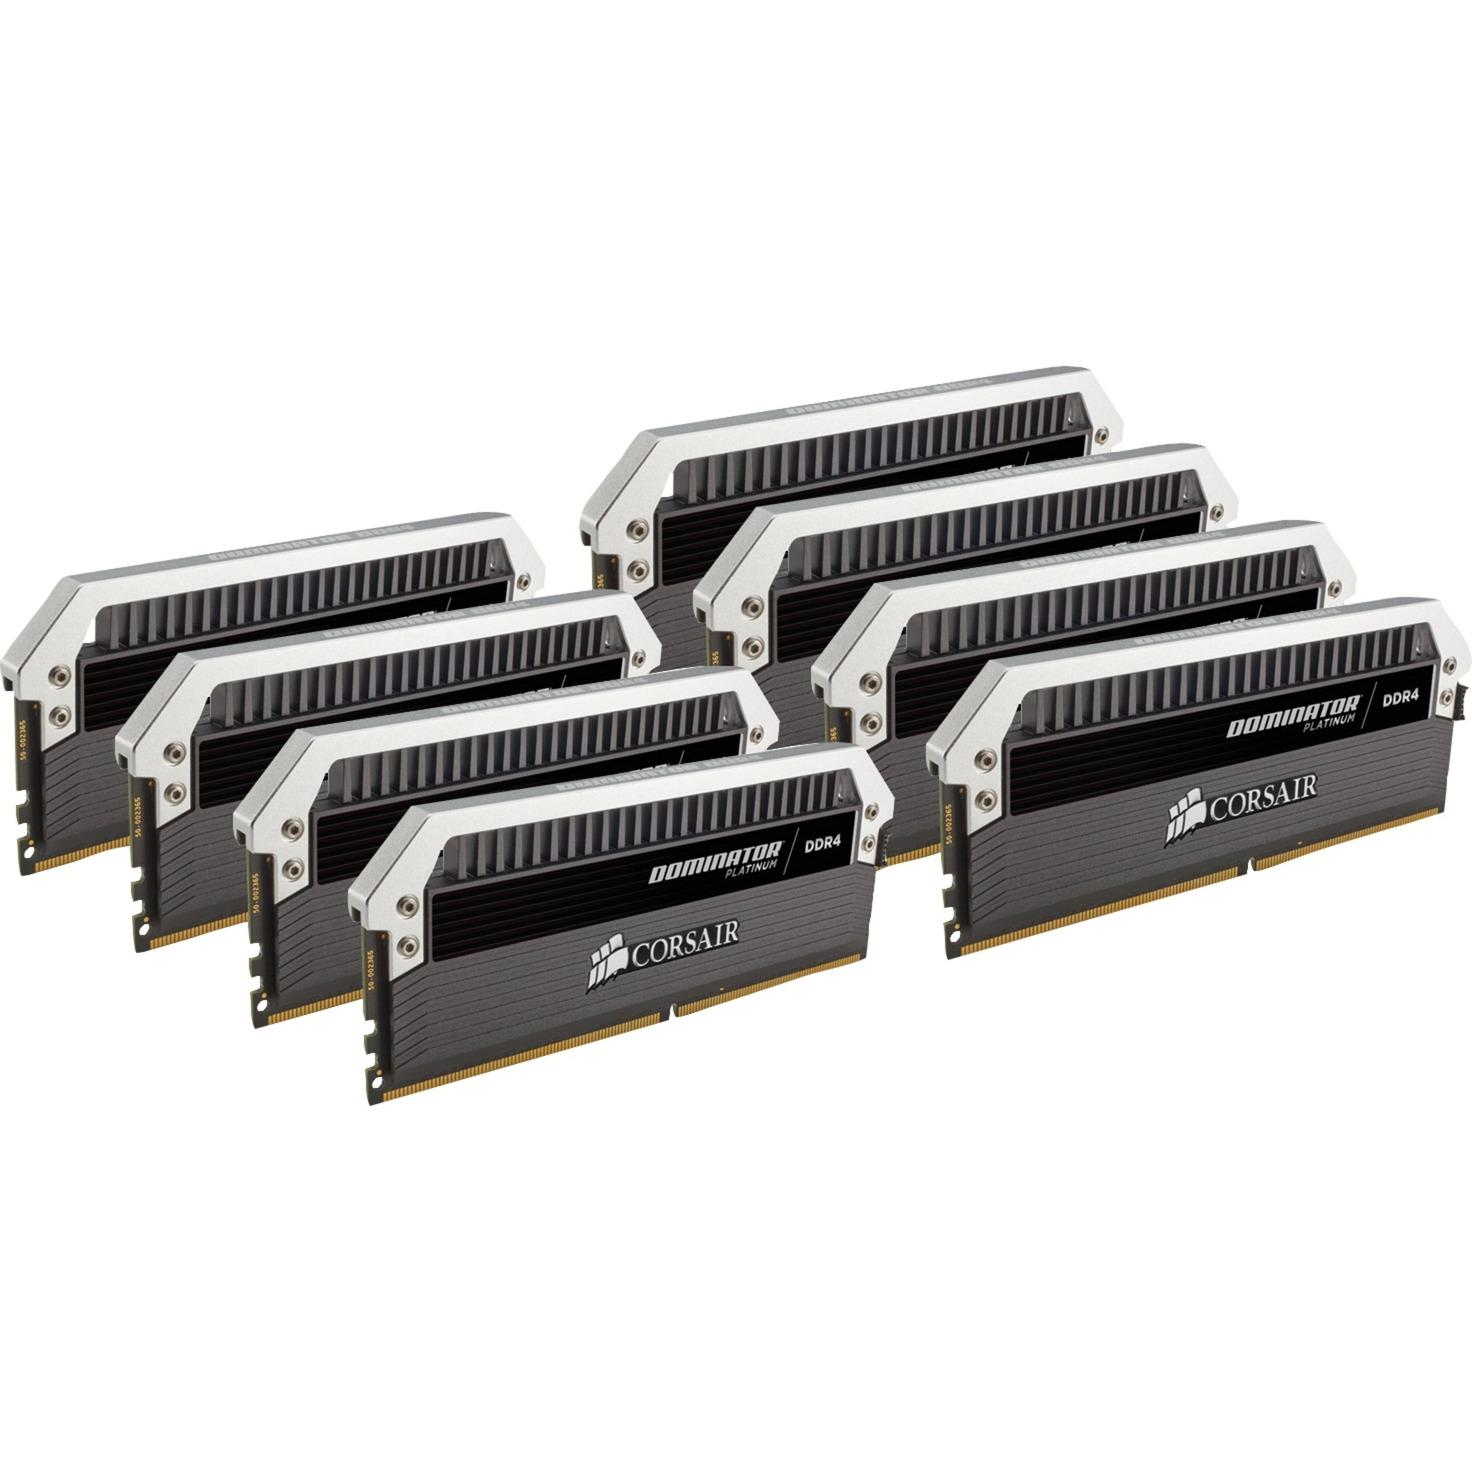 128 GB, 3000 MHz, DDR4 módulo de memoria, Memoria RAM